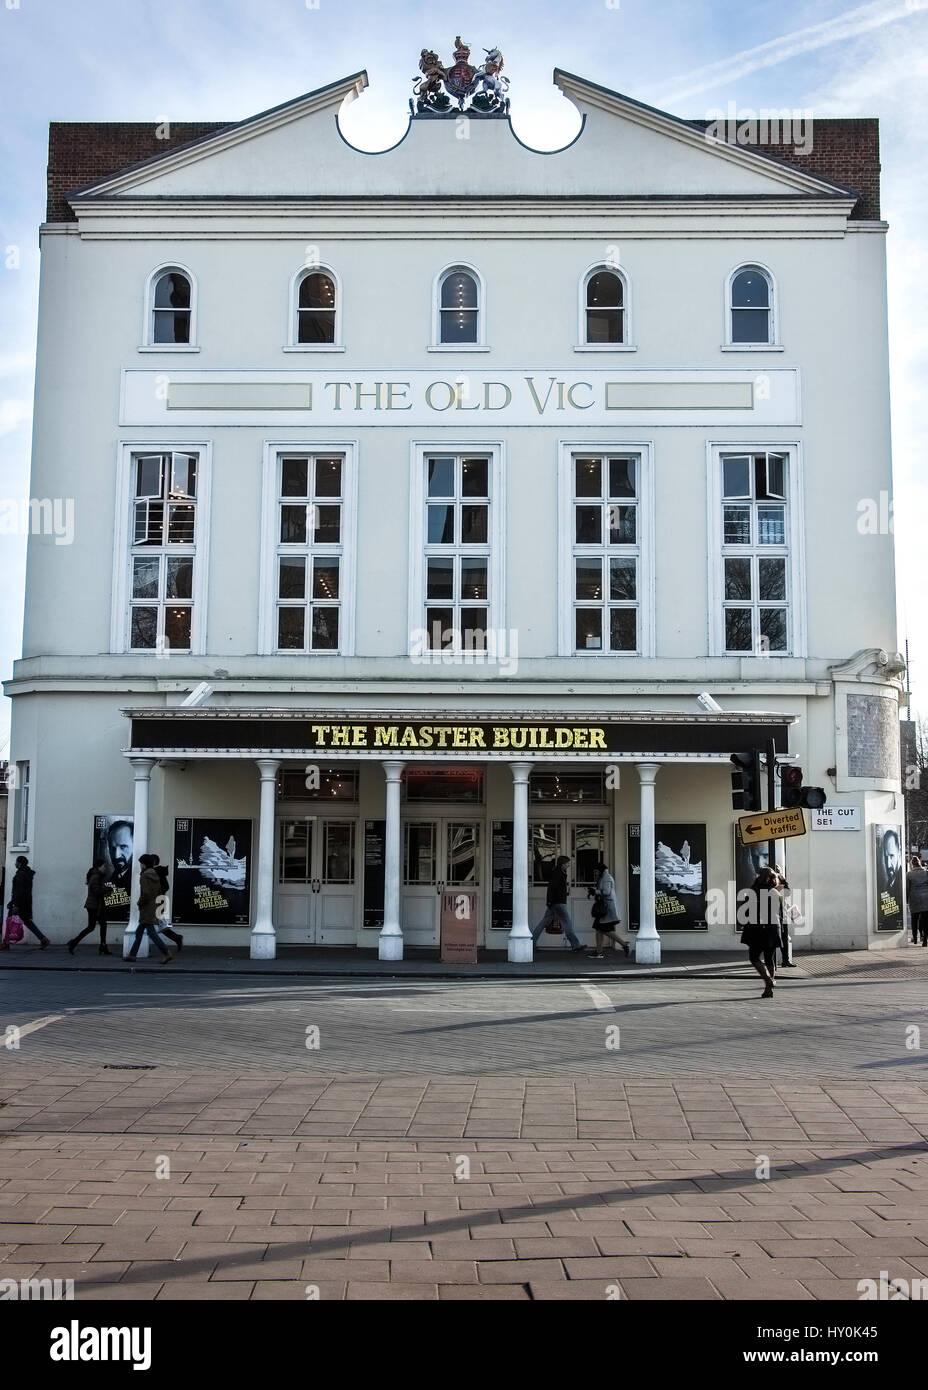 Old Vic theatre London Waterloo - Stock Image